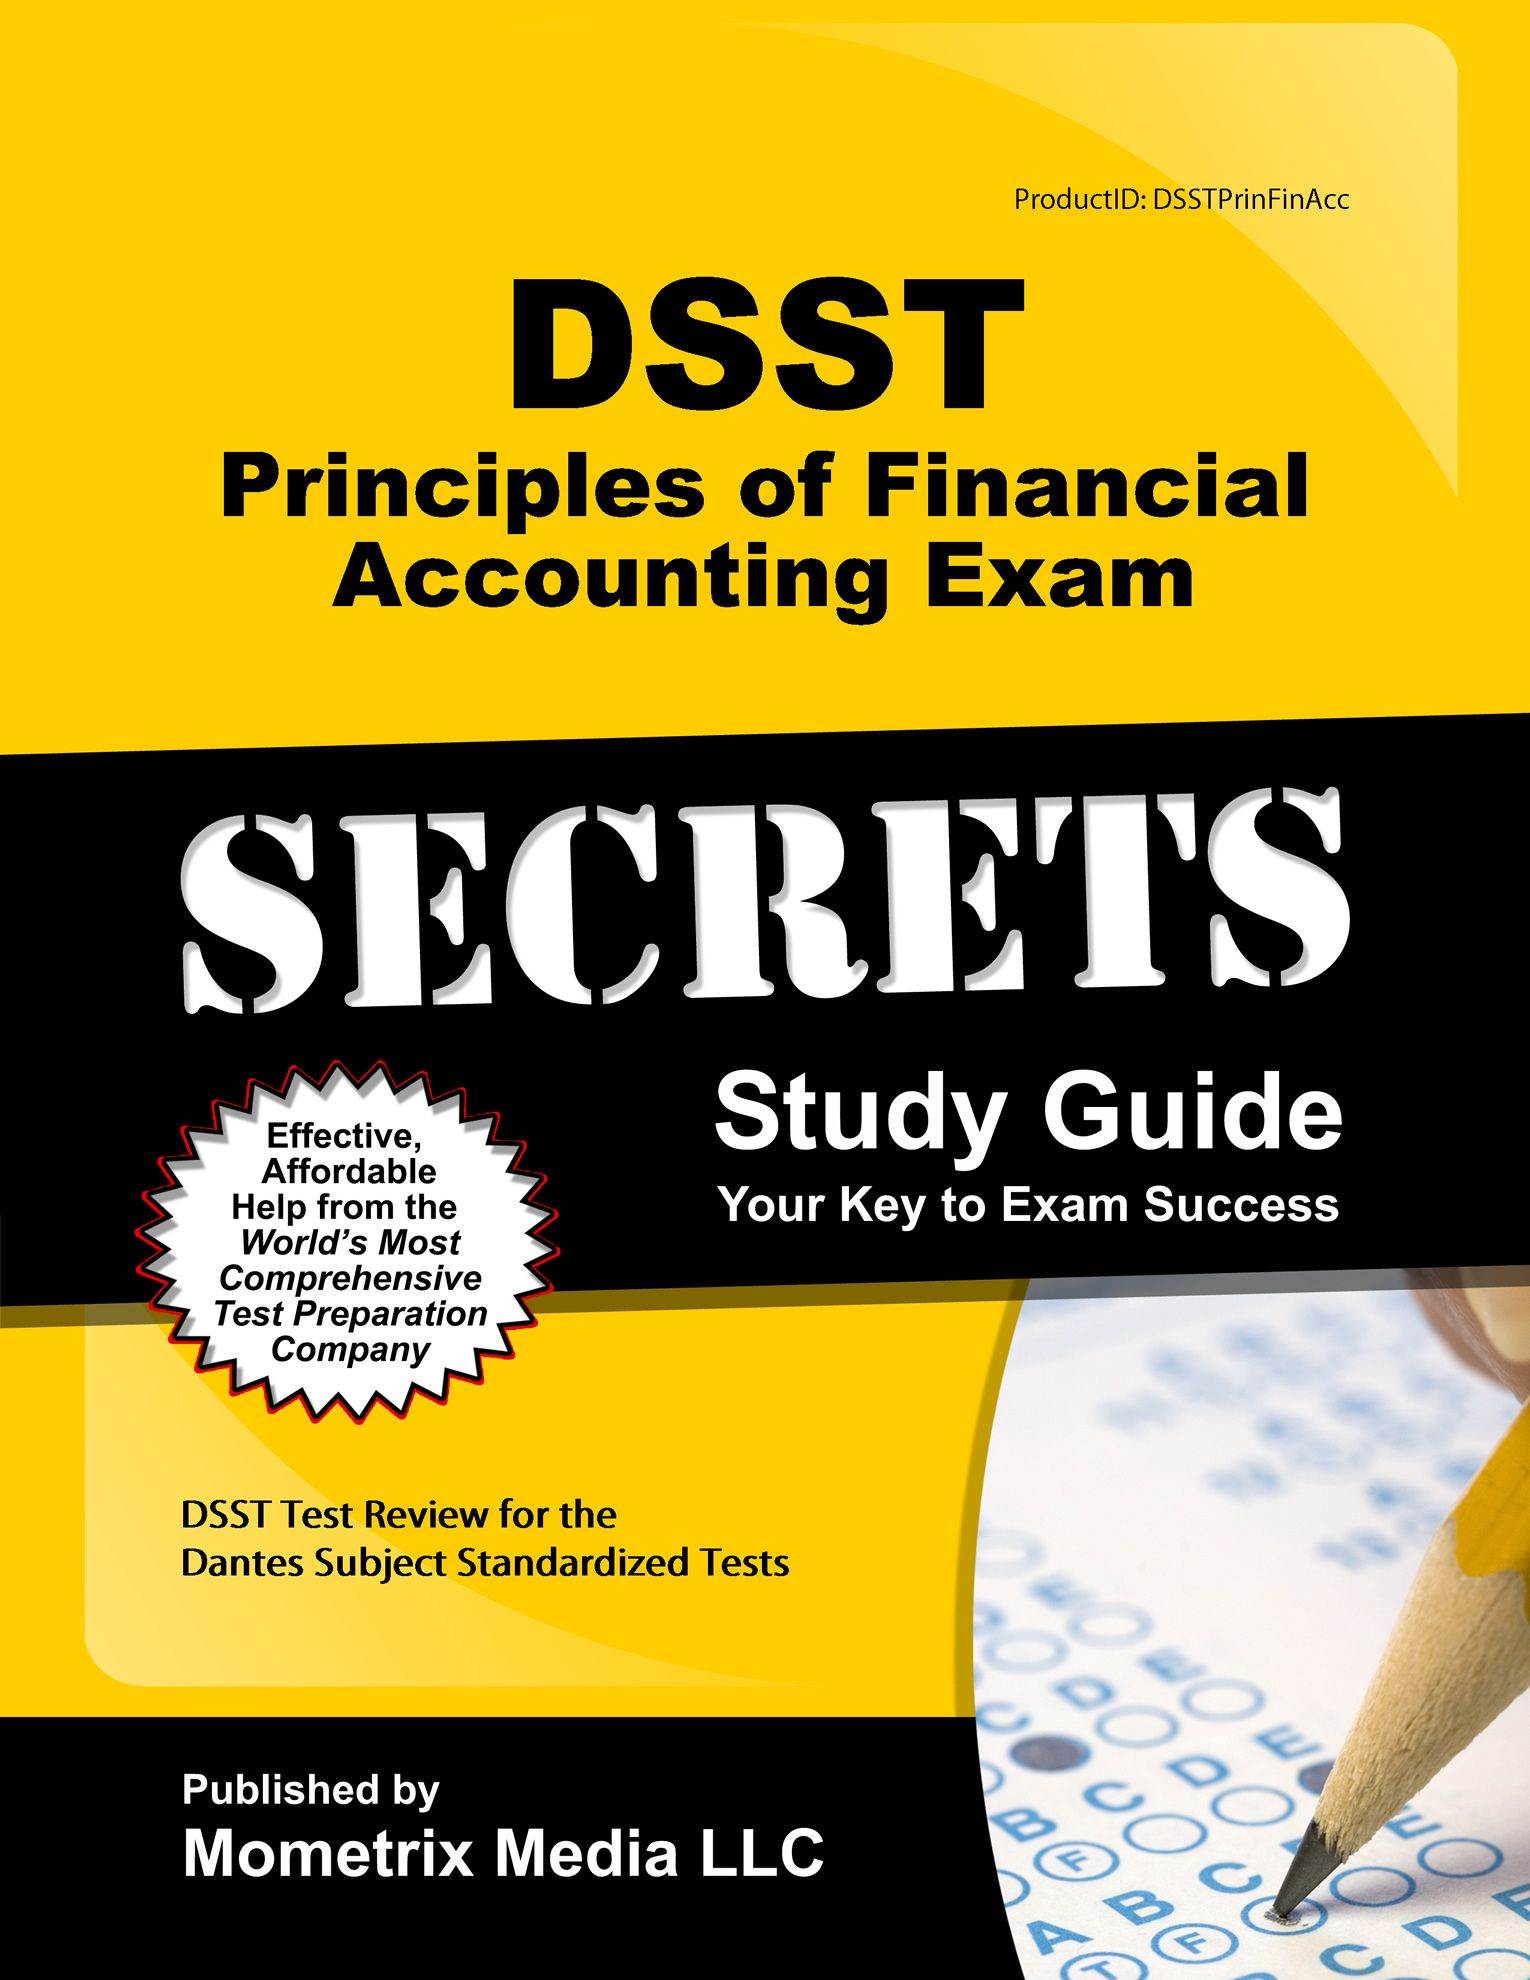 DSST Principles of Financial Accounting Exam Study Guide  http://www.mo-media.com/dsst/ #dsst